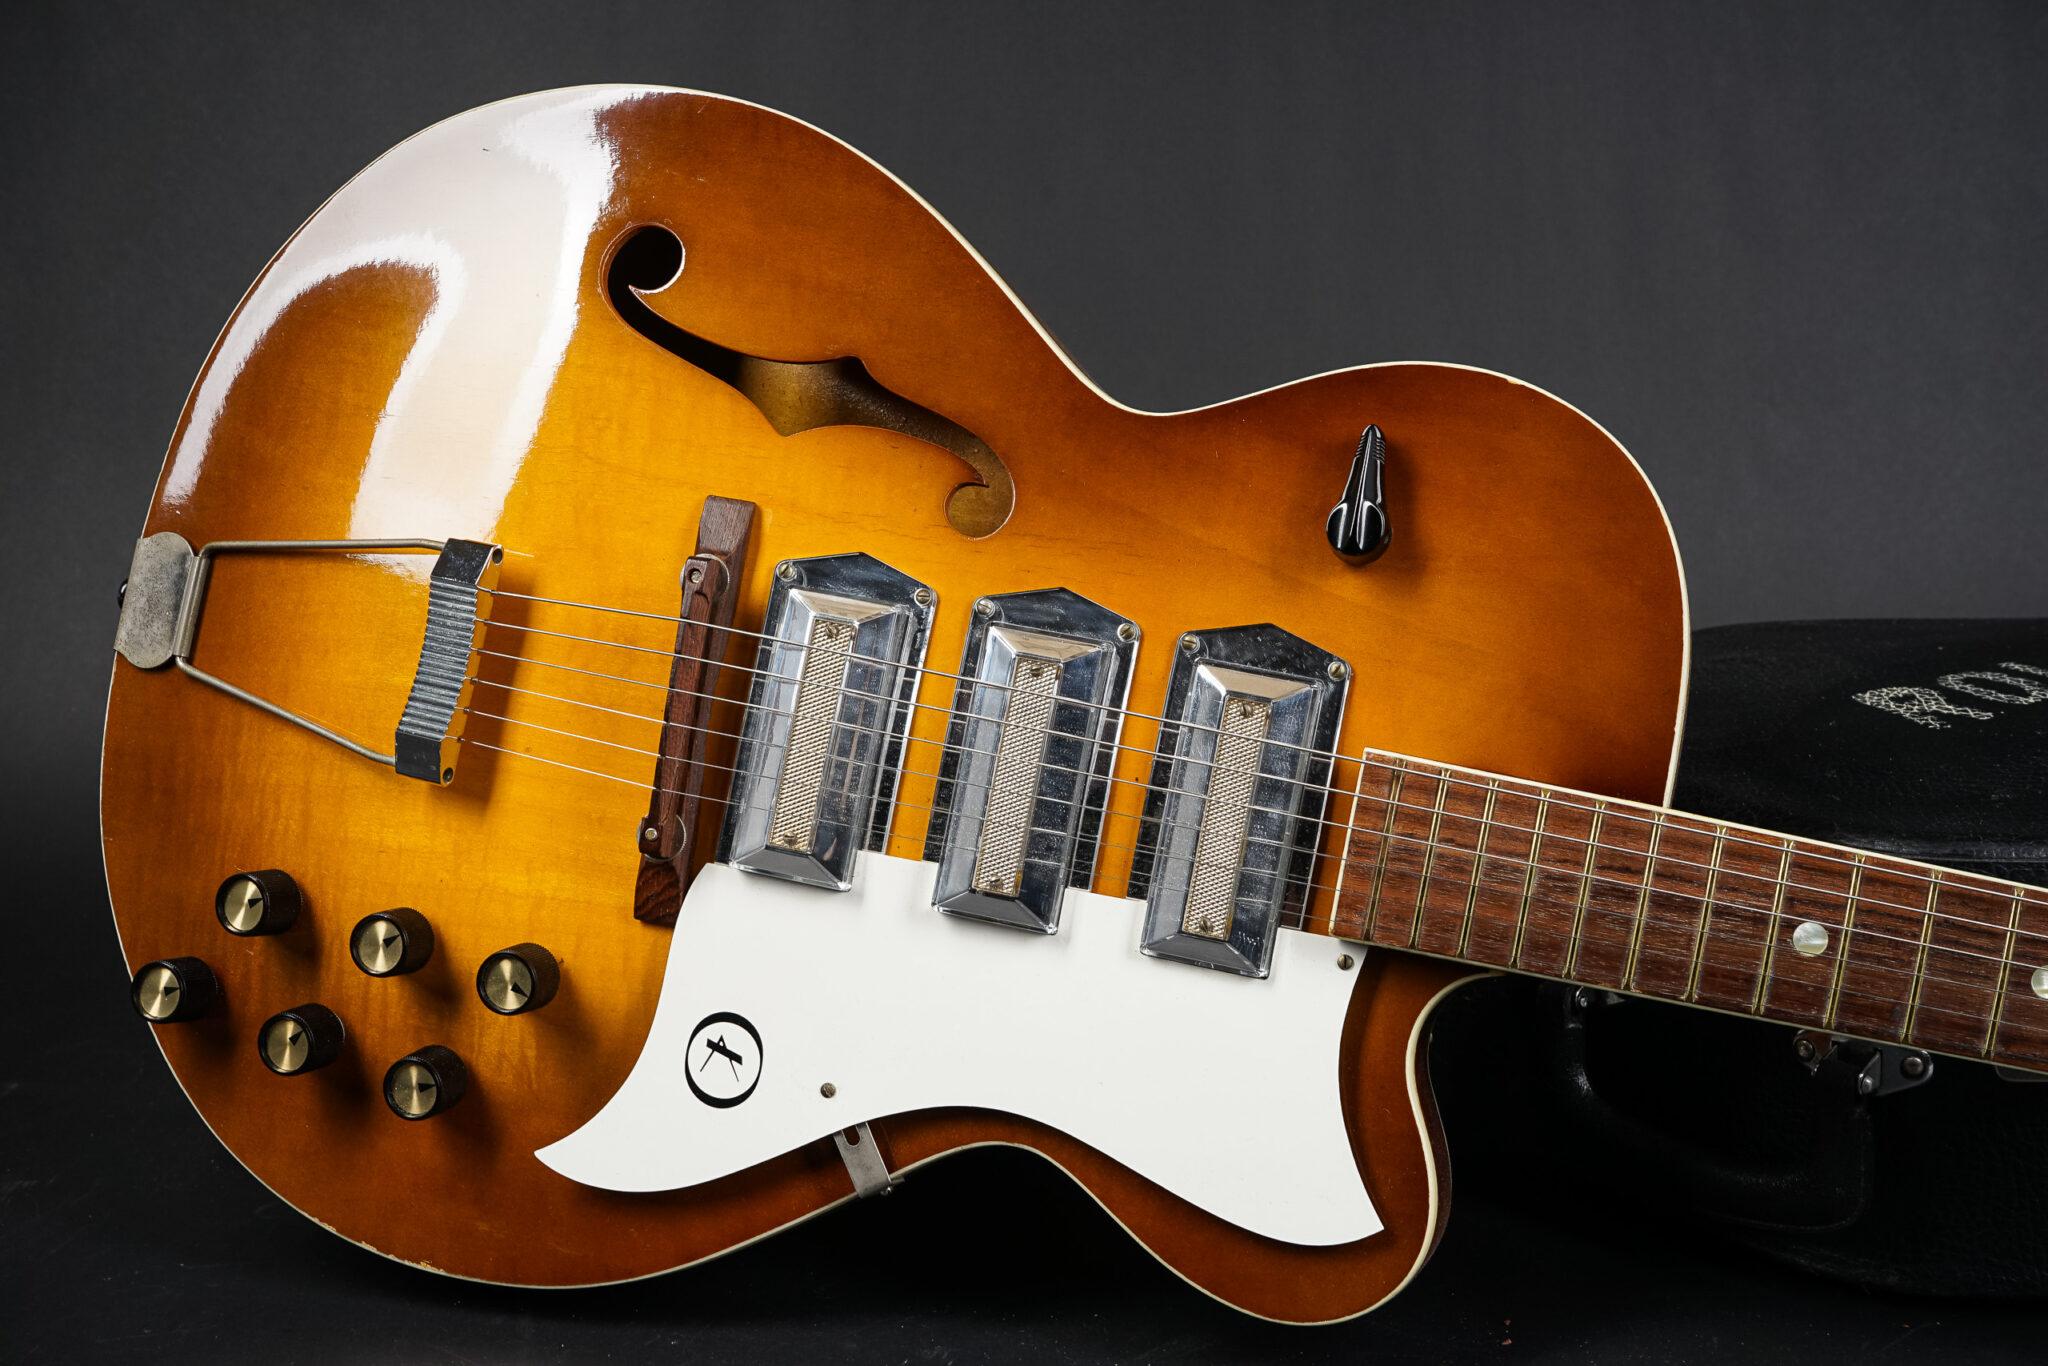 https://guitarpoint.de/app/uploads/products/1966-kay-swingmaster-sunburst/1966-kay-swingerclub-1-2048x1366.jpg